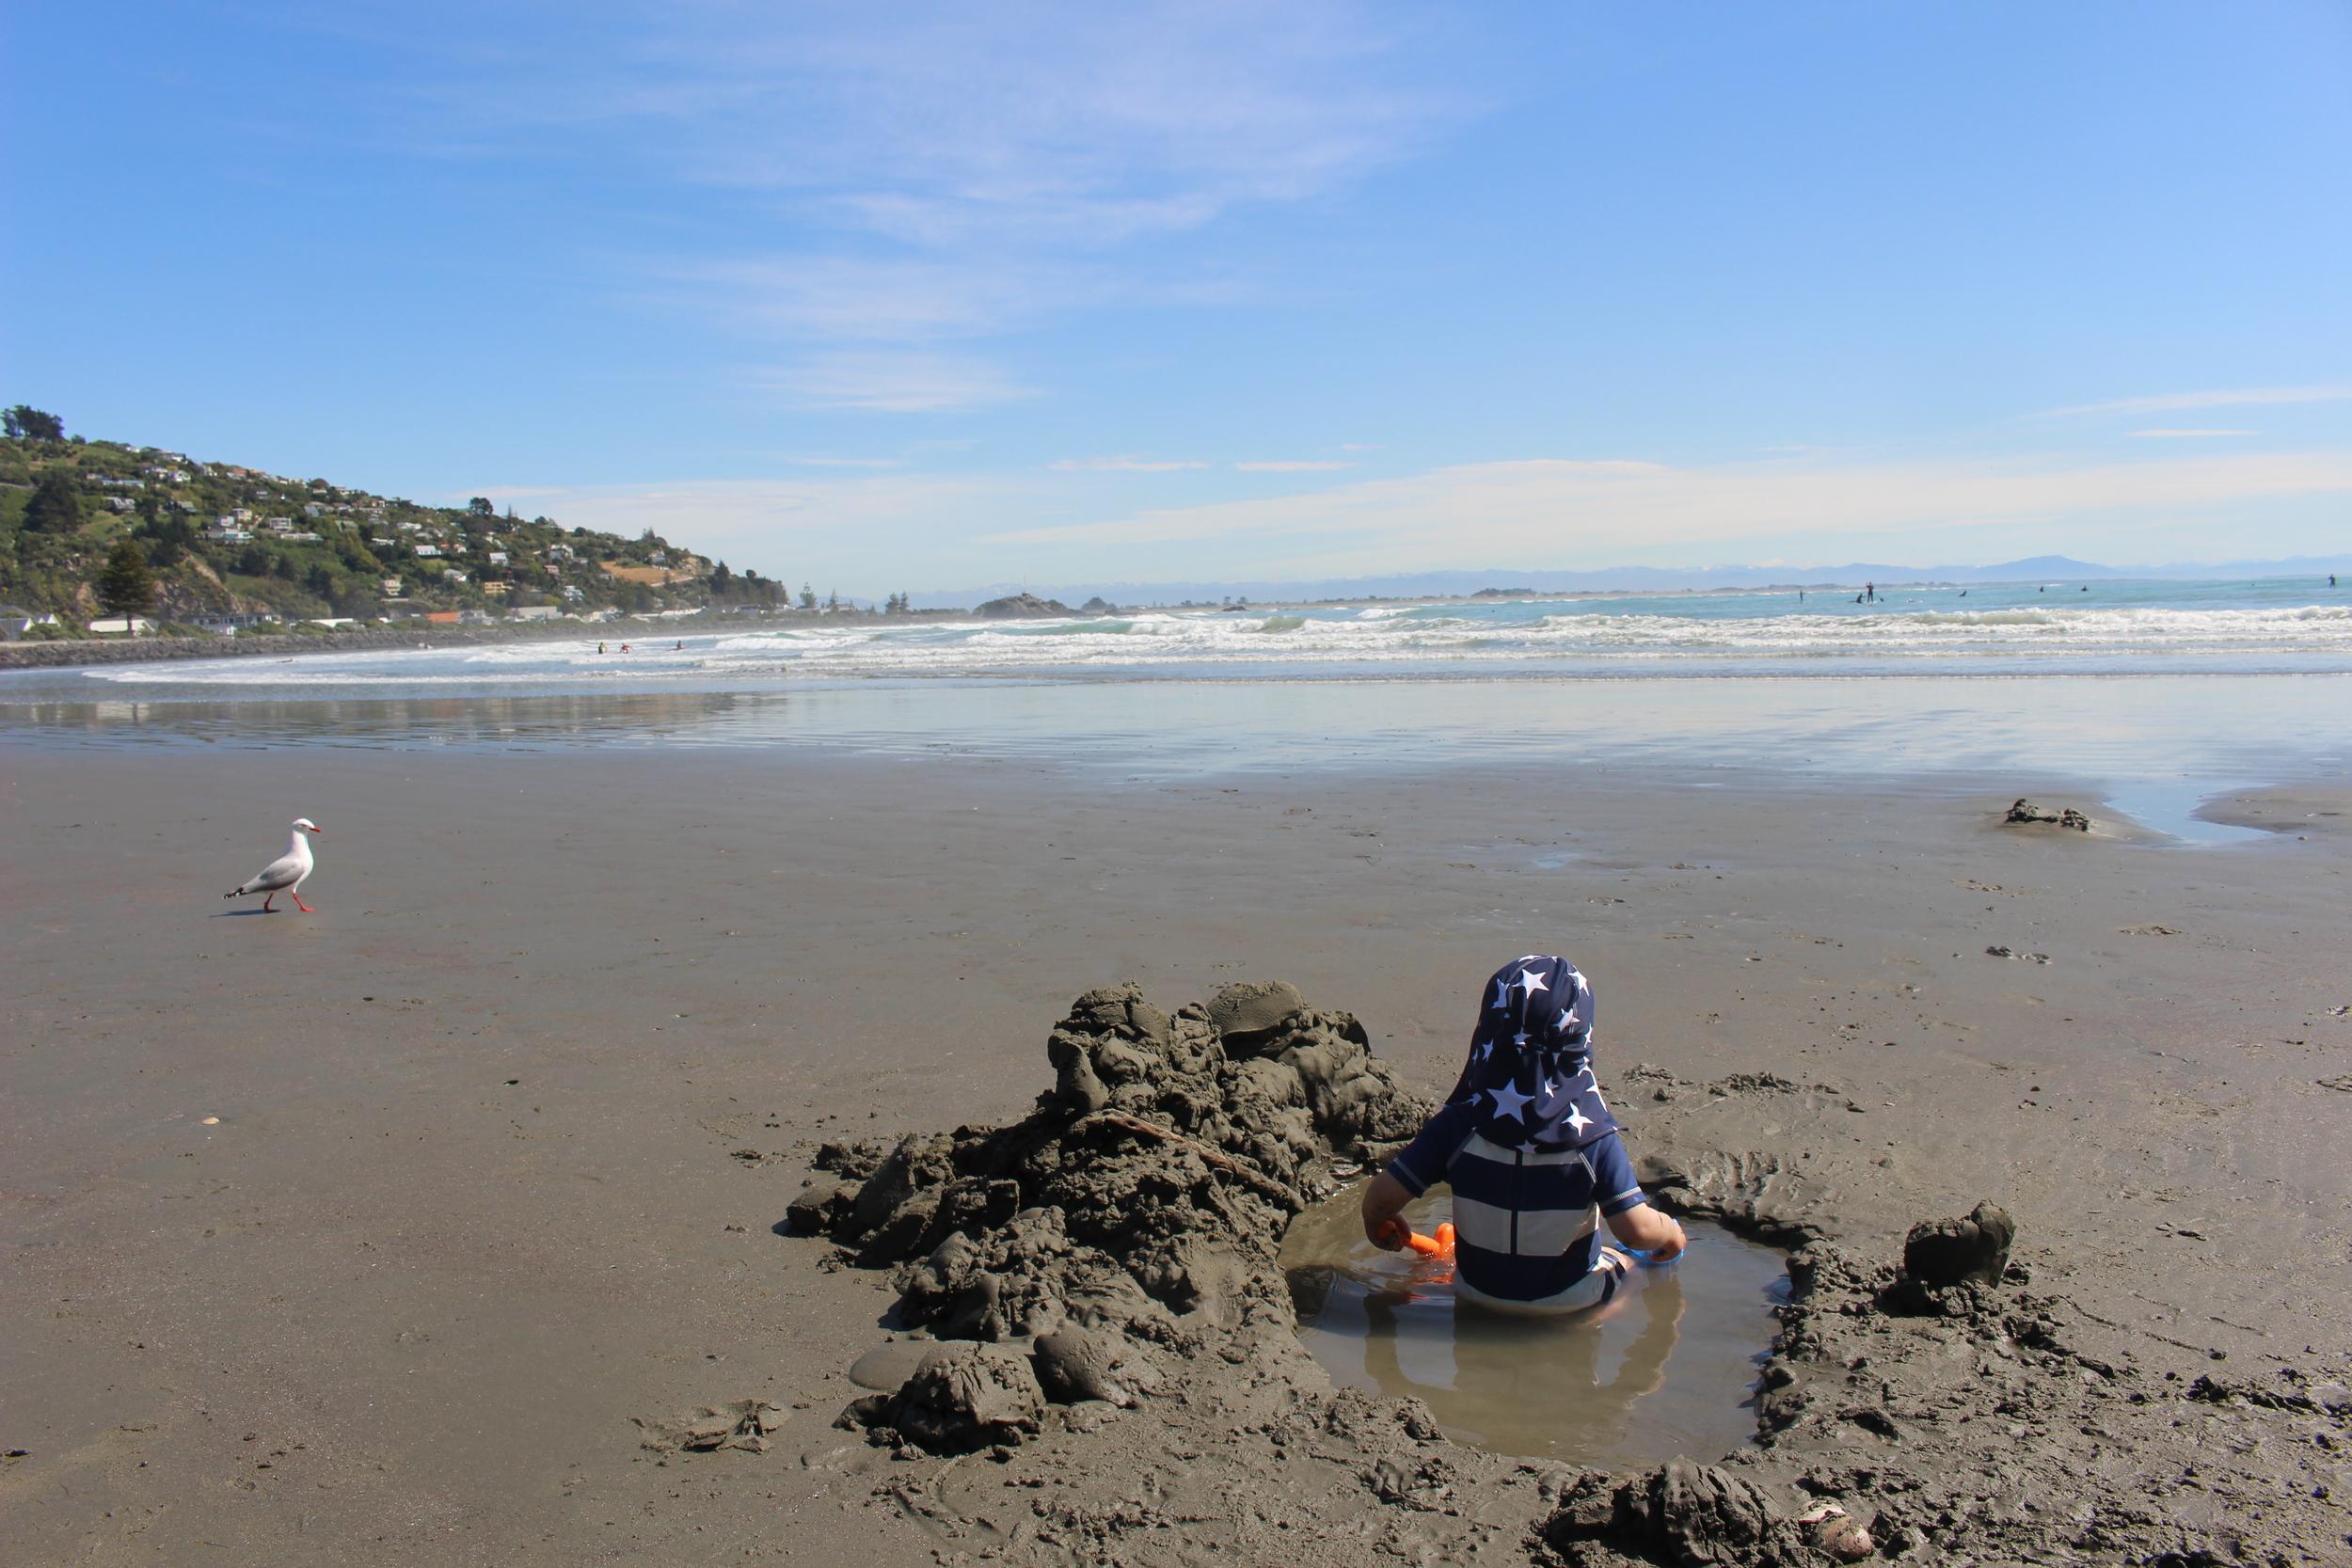 Sunstone marketing lad enjoys Sumner Beach, Christchurch, NZ